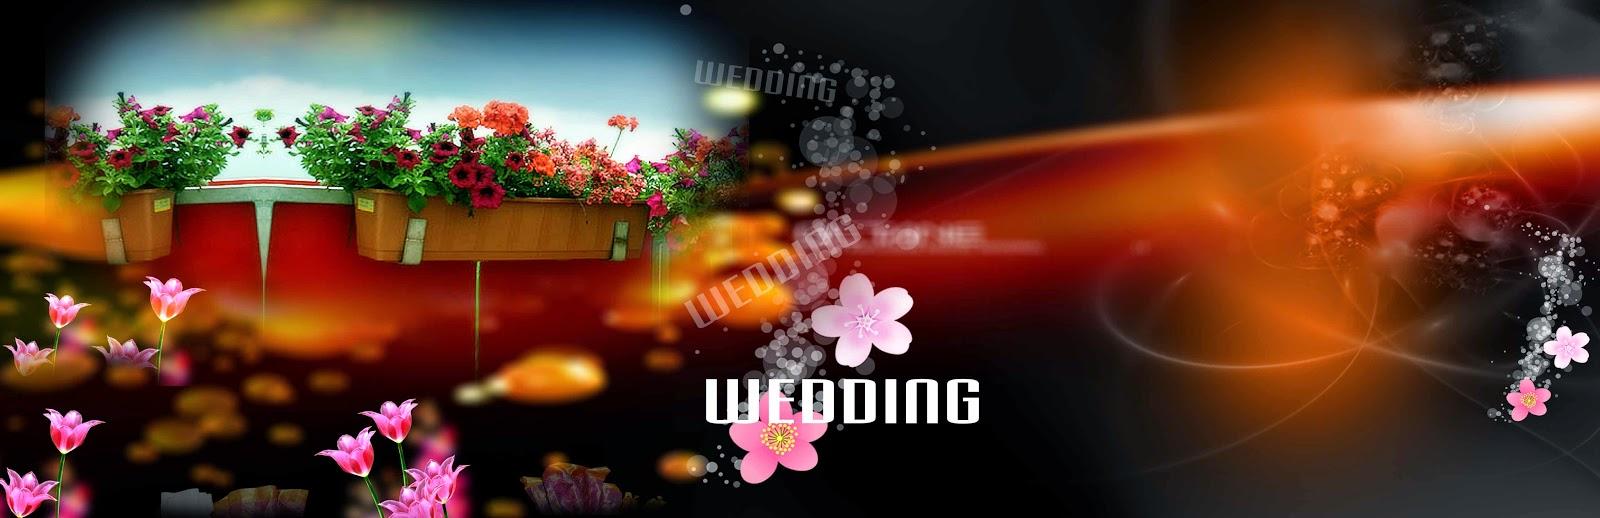 Creative Psd Files 12x36 Karizma Wedding Album Psd Files Free Download